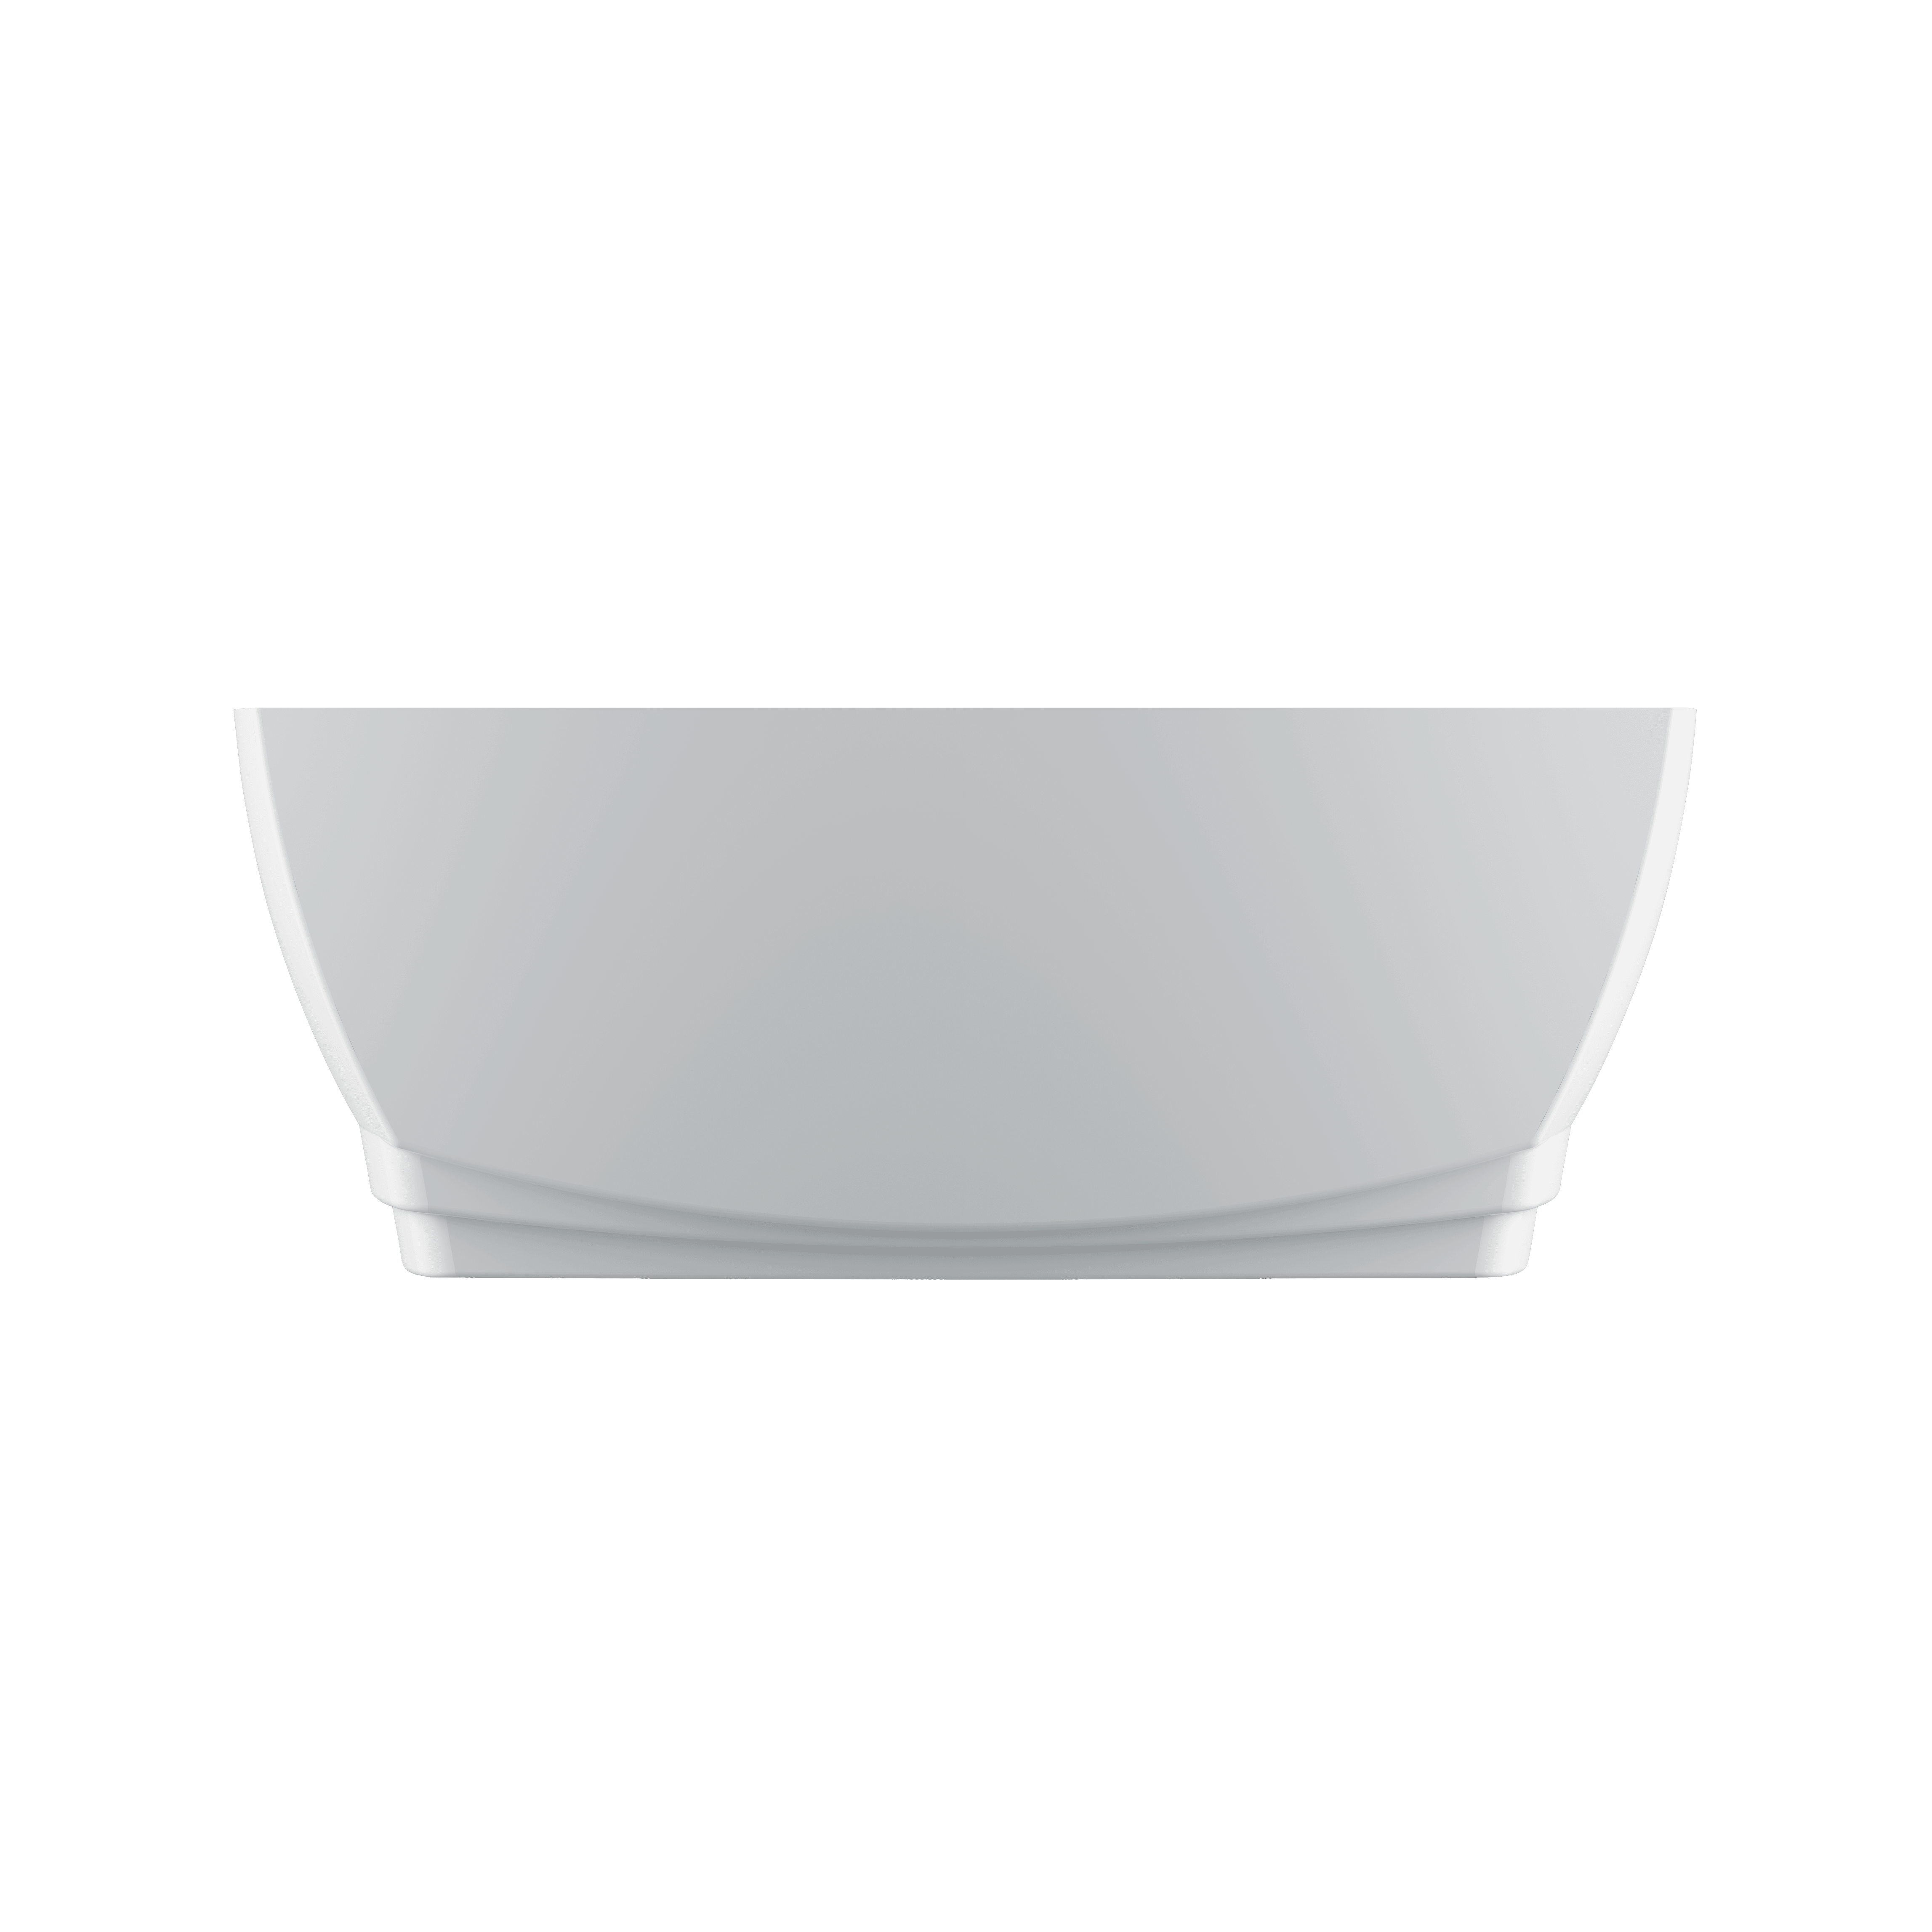 Bain Ultra BEA3RF00T-01 Esthesia Thermomasseur Tub | QualityBath.com